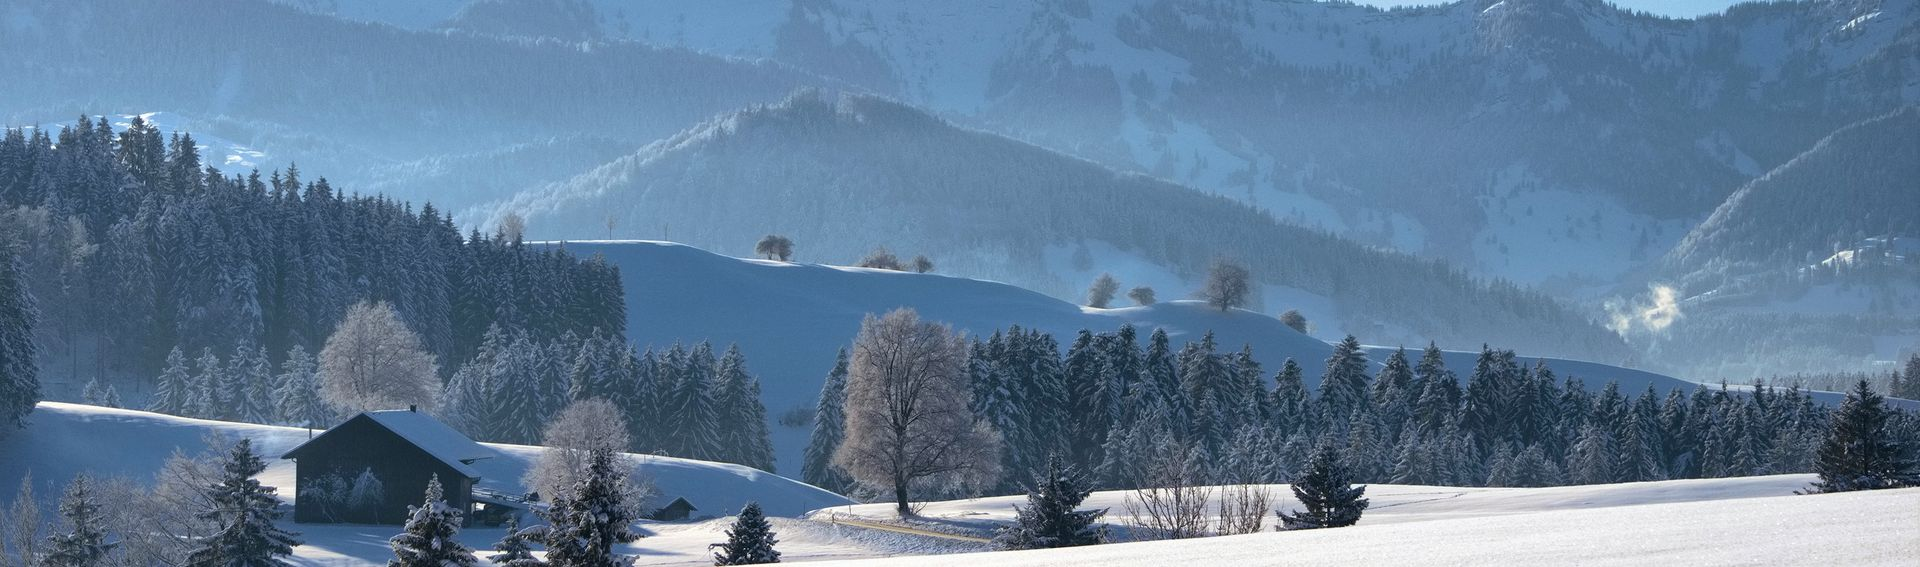 Oberstaufen